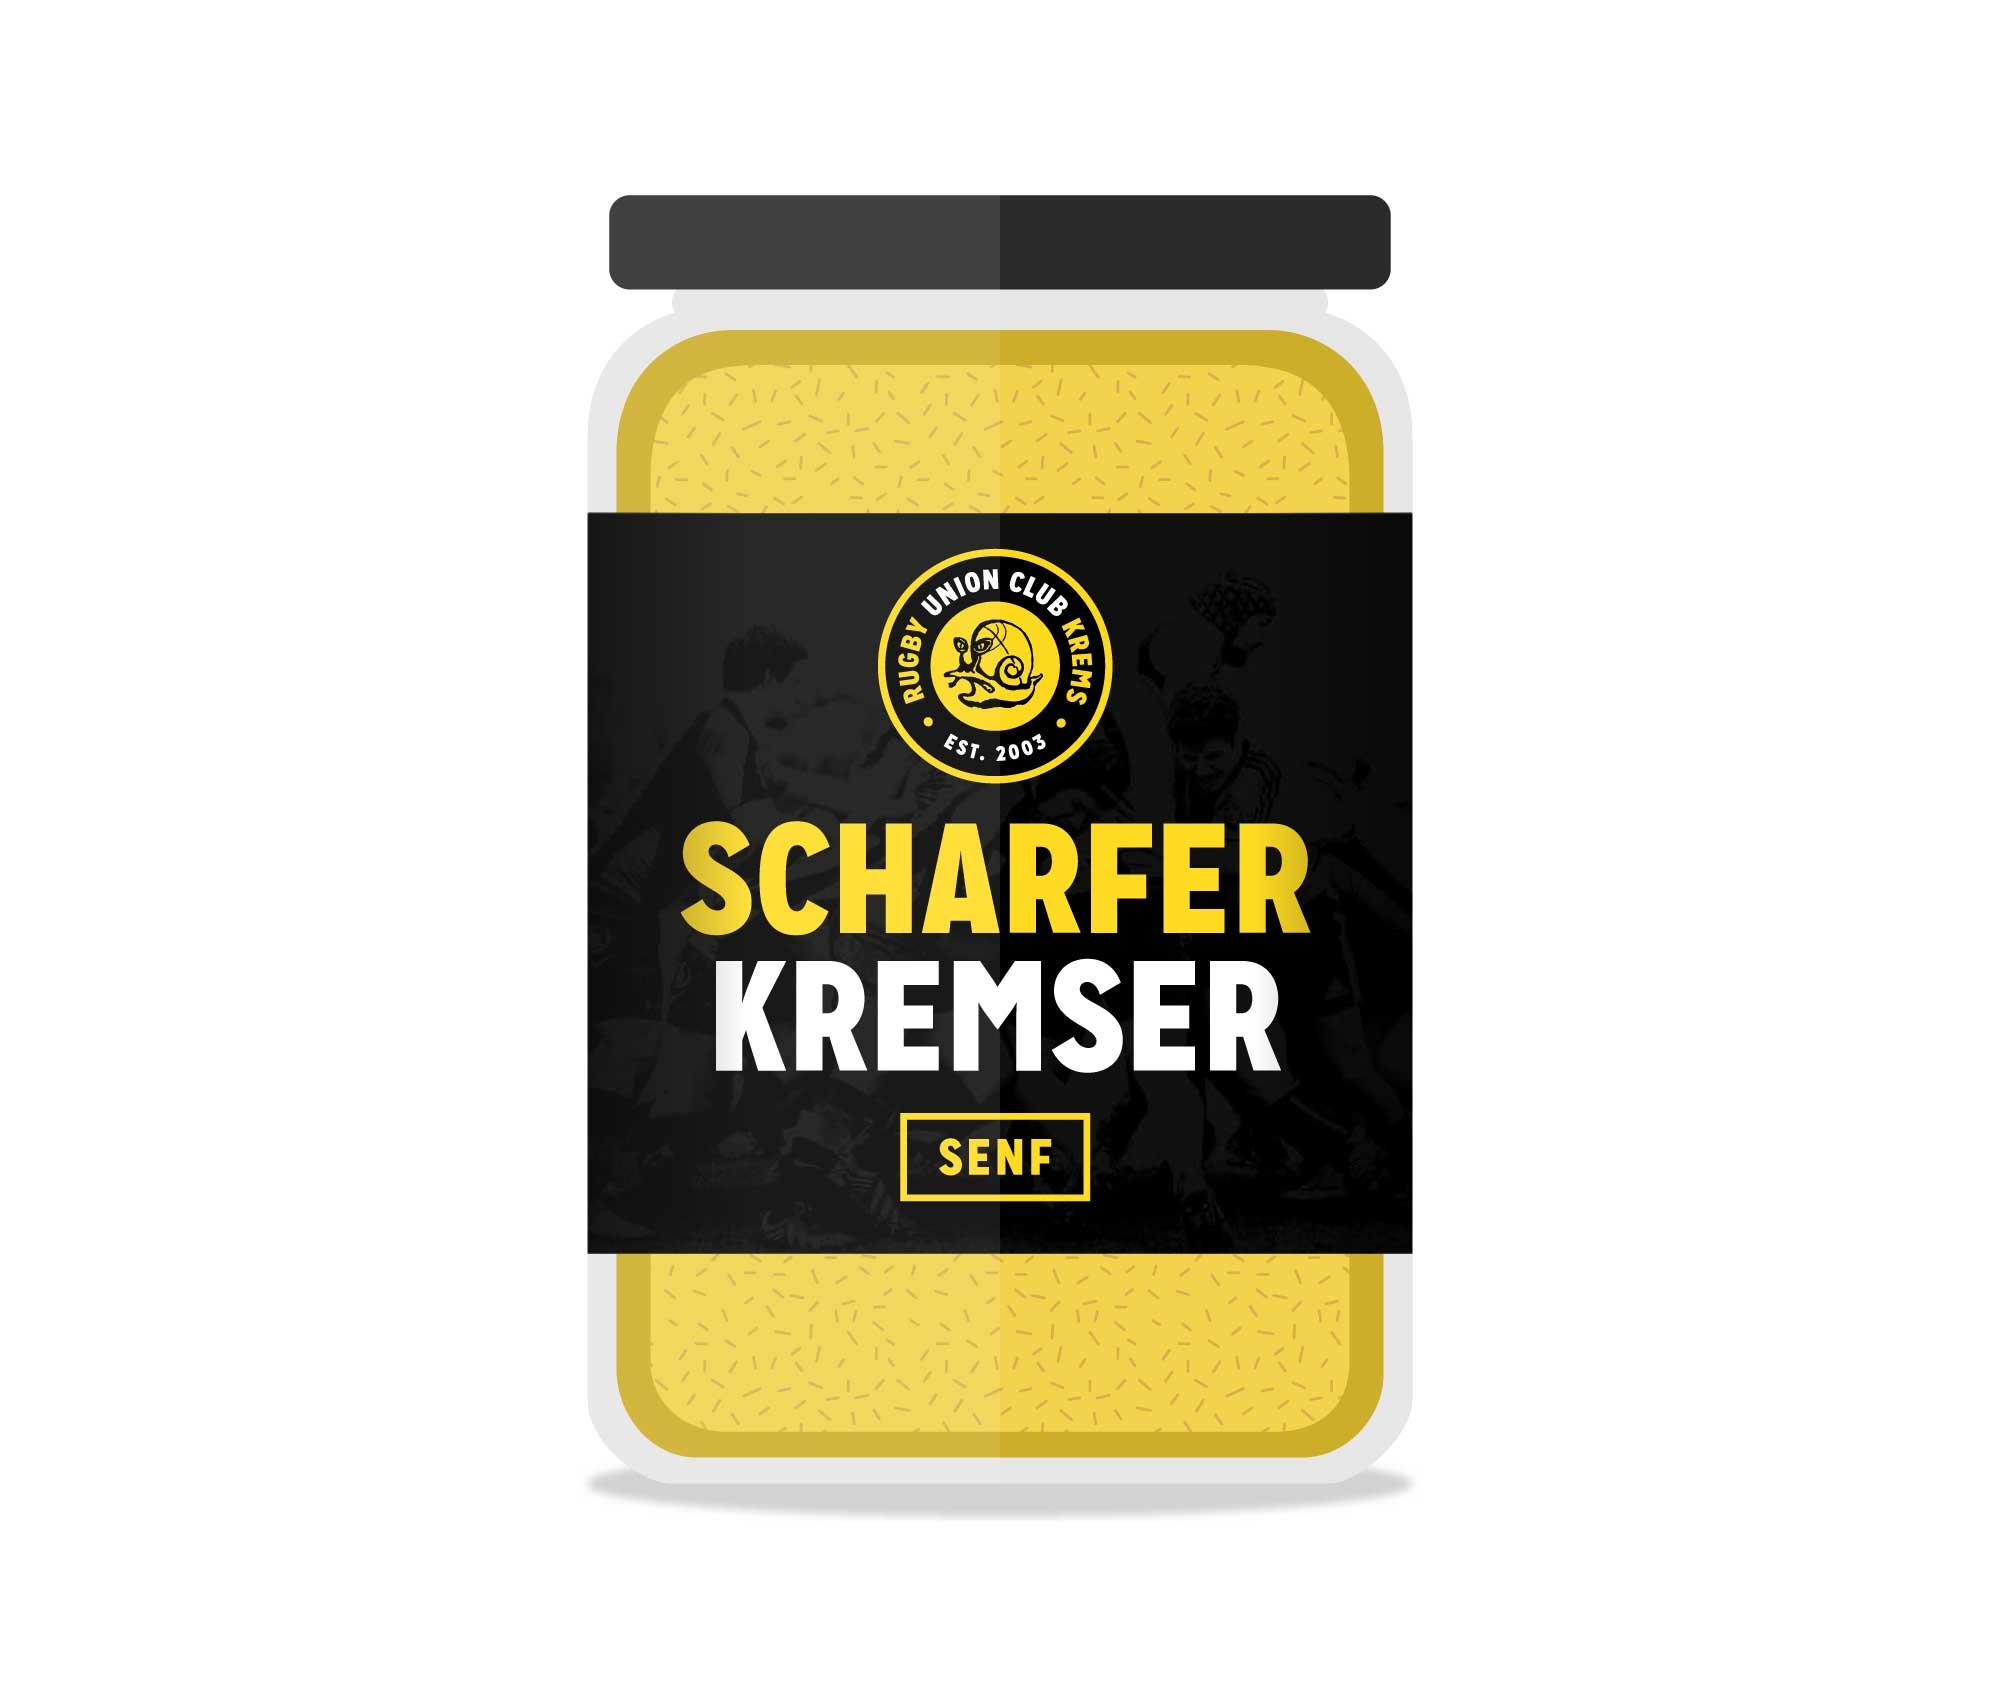 Scharfer Kremser Senf